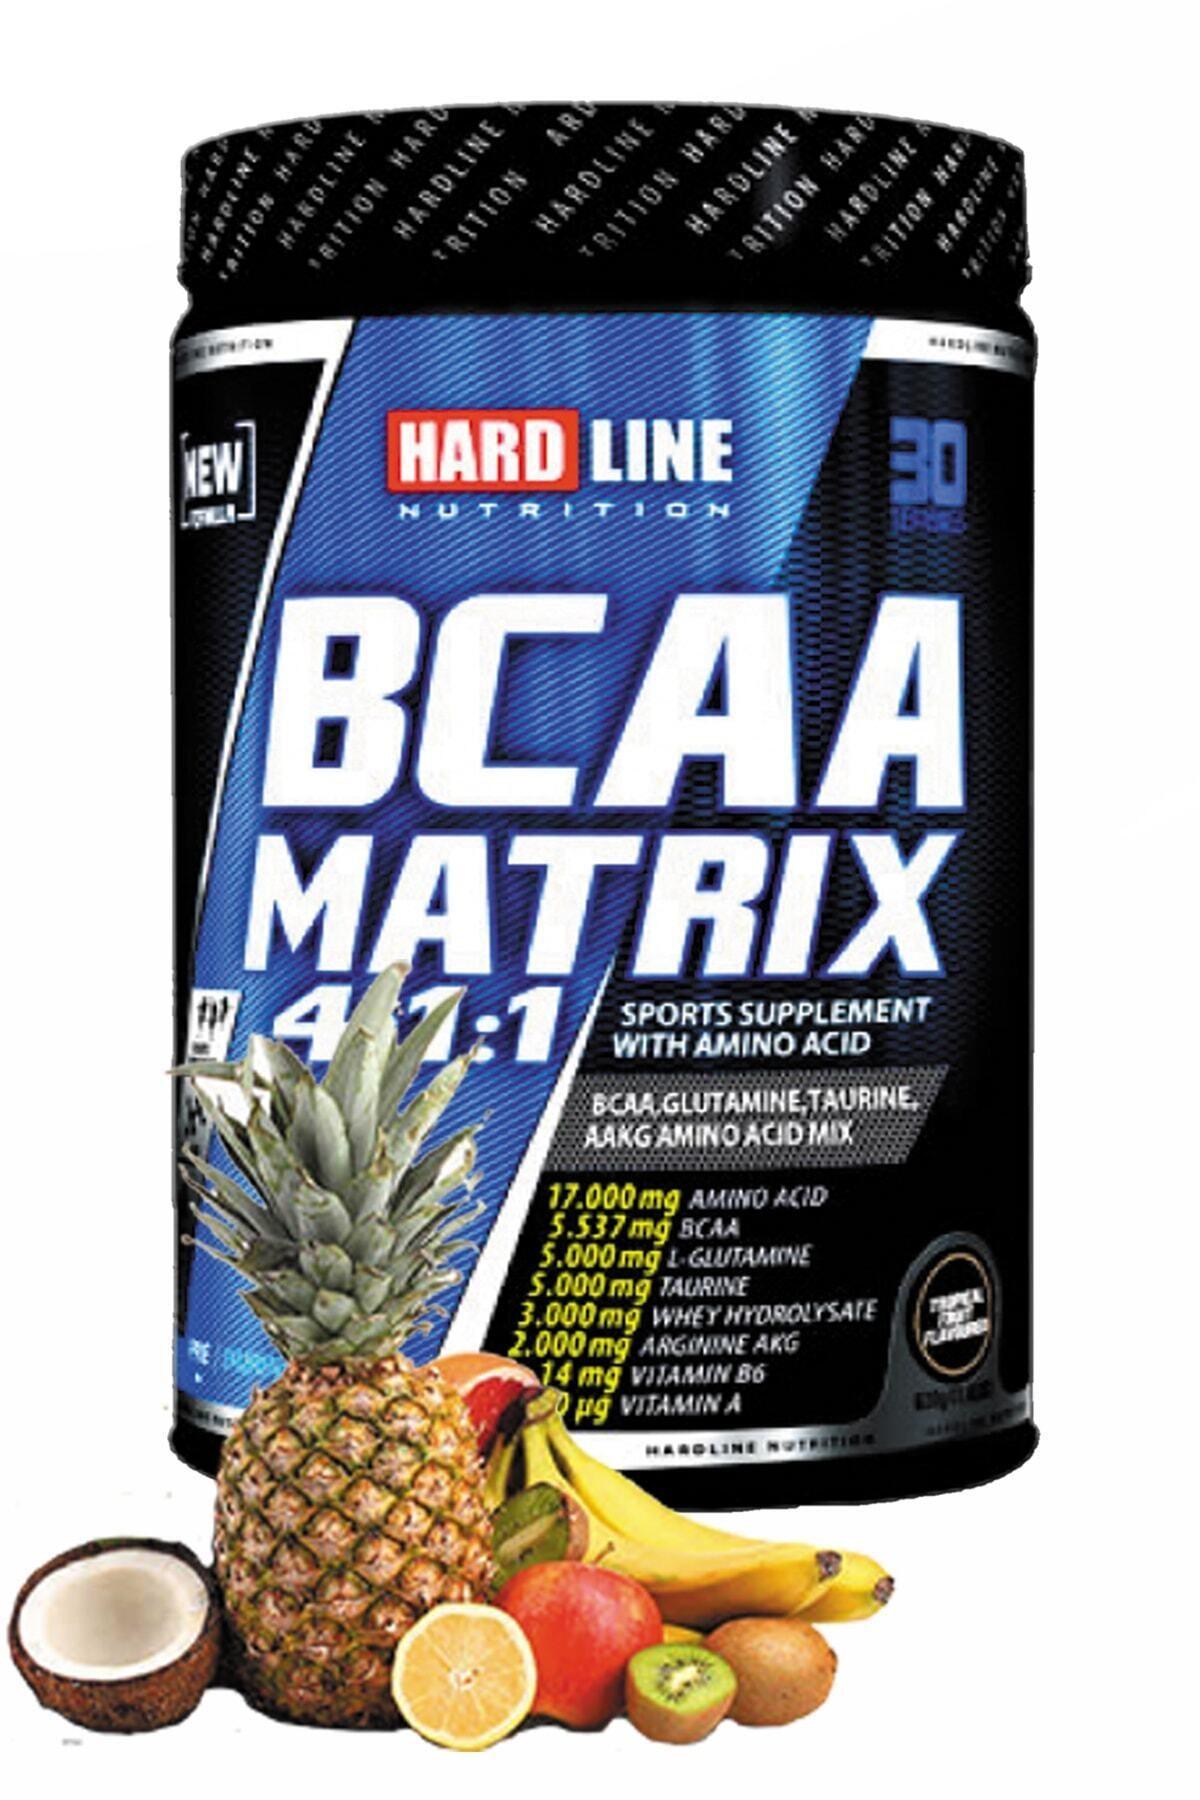 Bcaa Matrix Tropikal 630 gr Aminoasit Amino Asit Bca Taurin L Glutamin